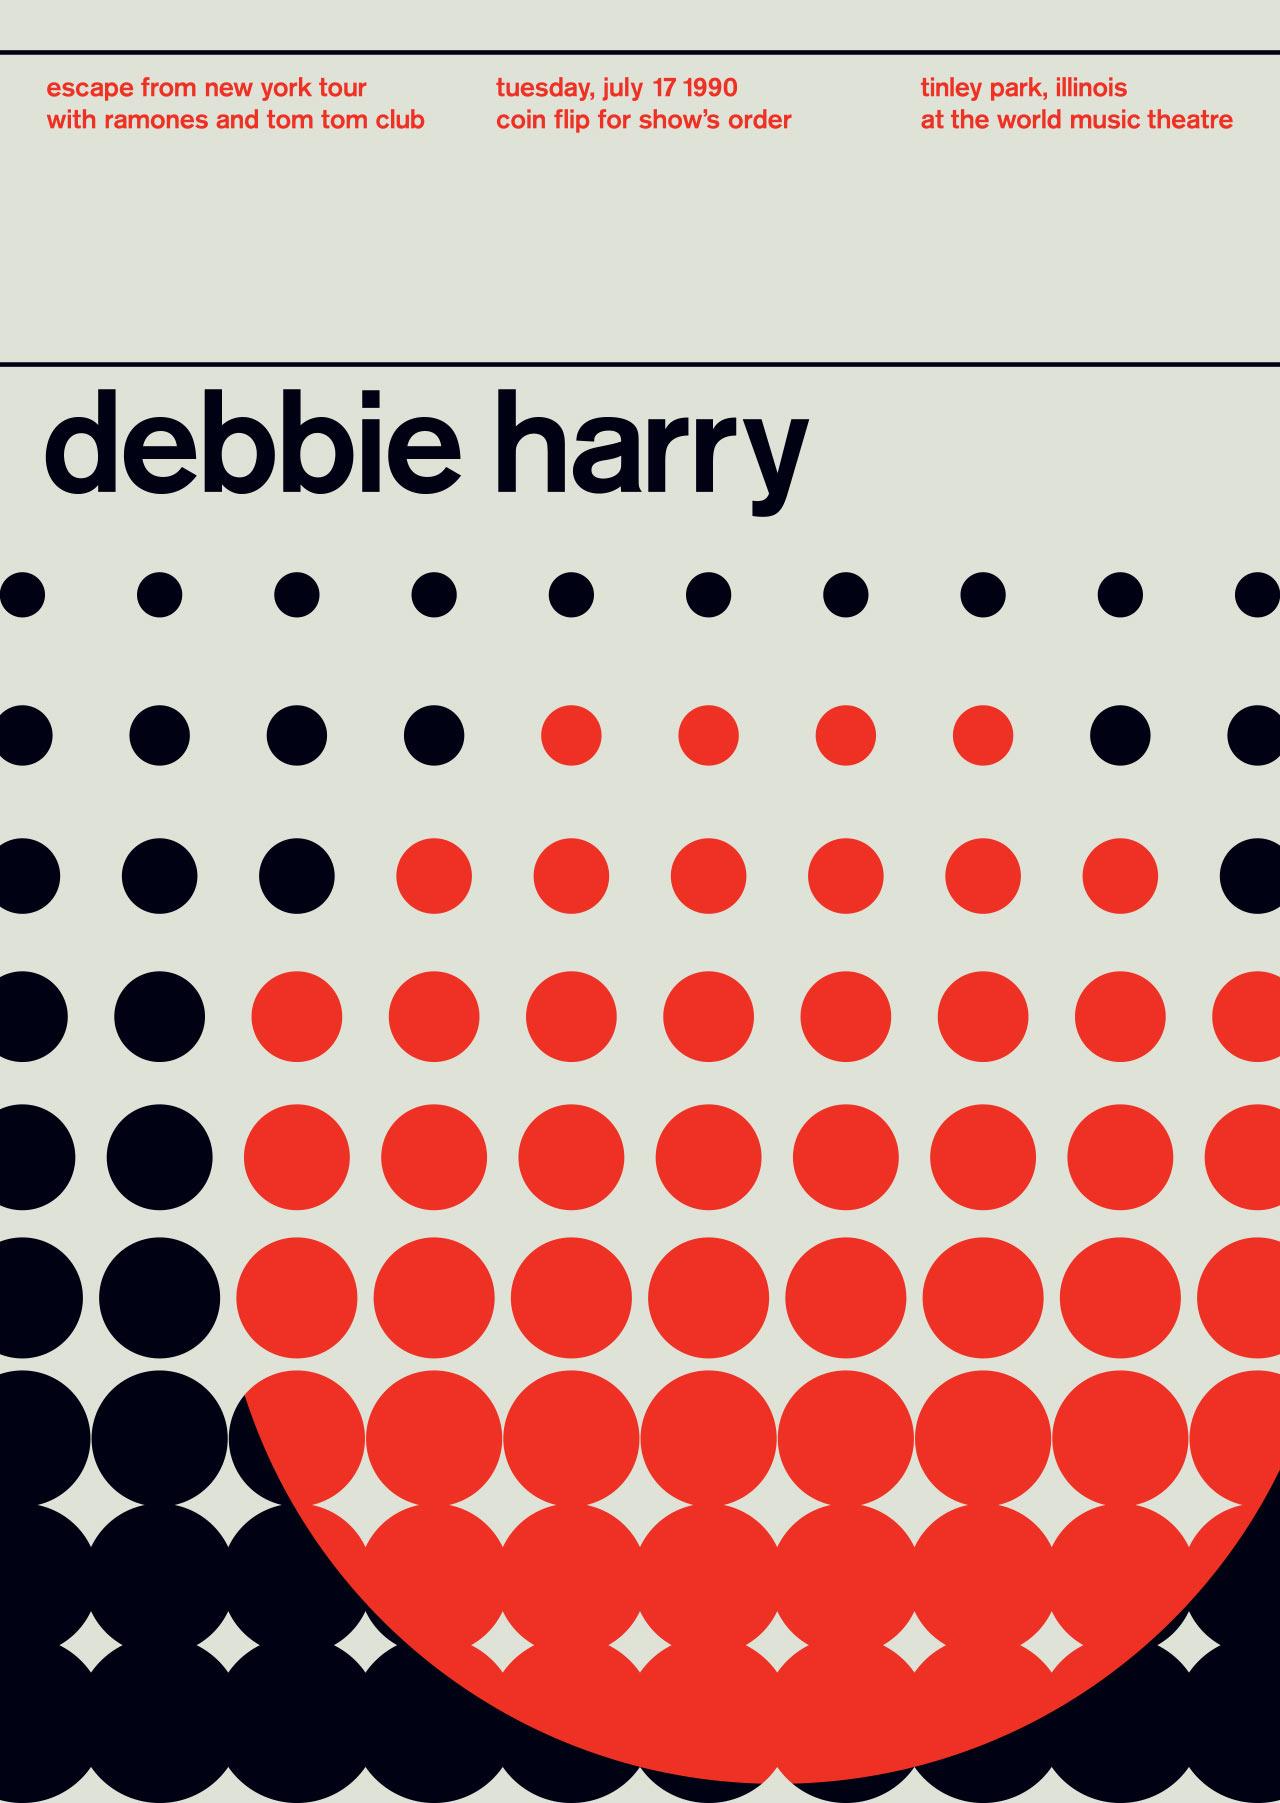 Swissted-Legends_Posters-3-debbie_harry_legends_series